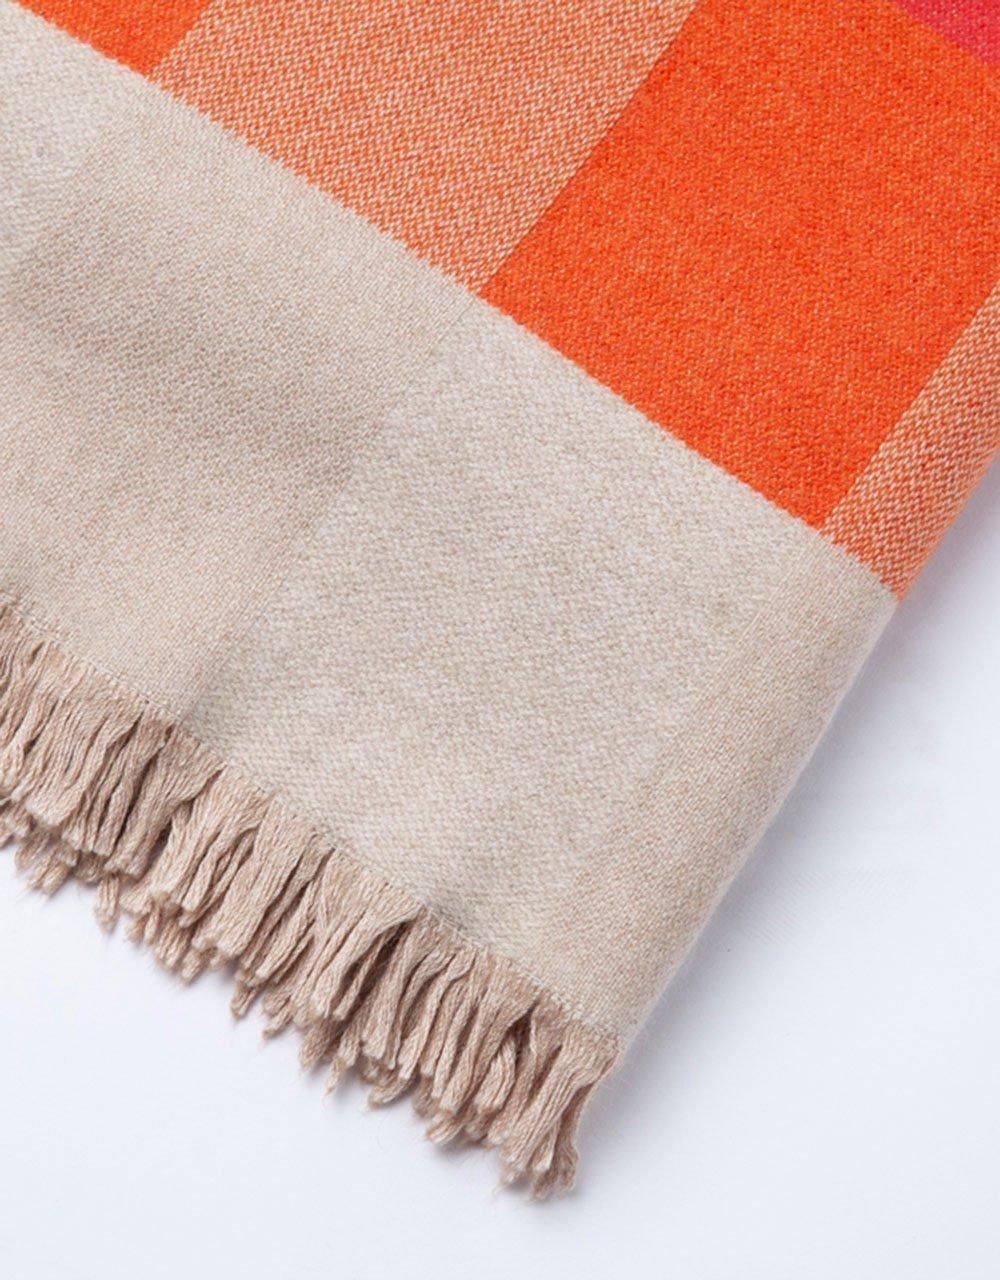 blanket08b